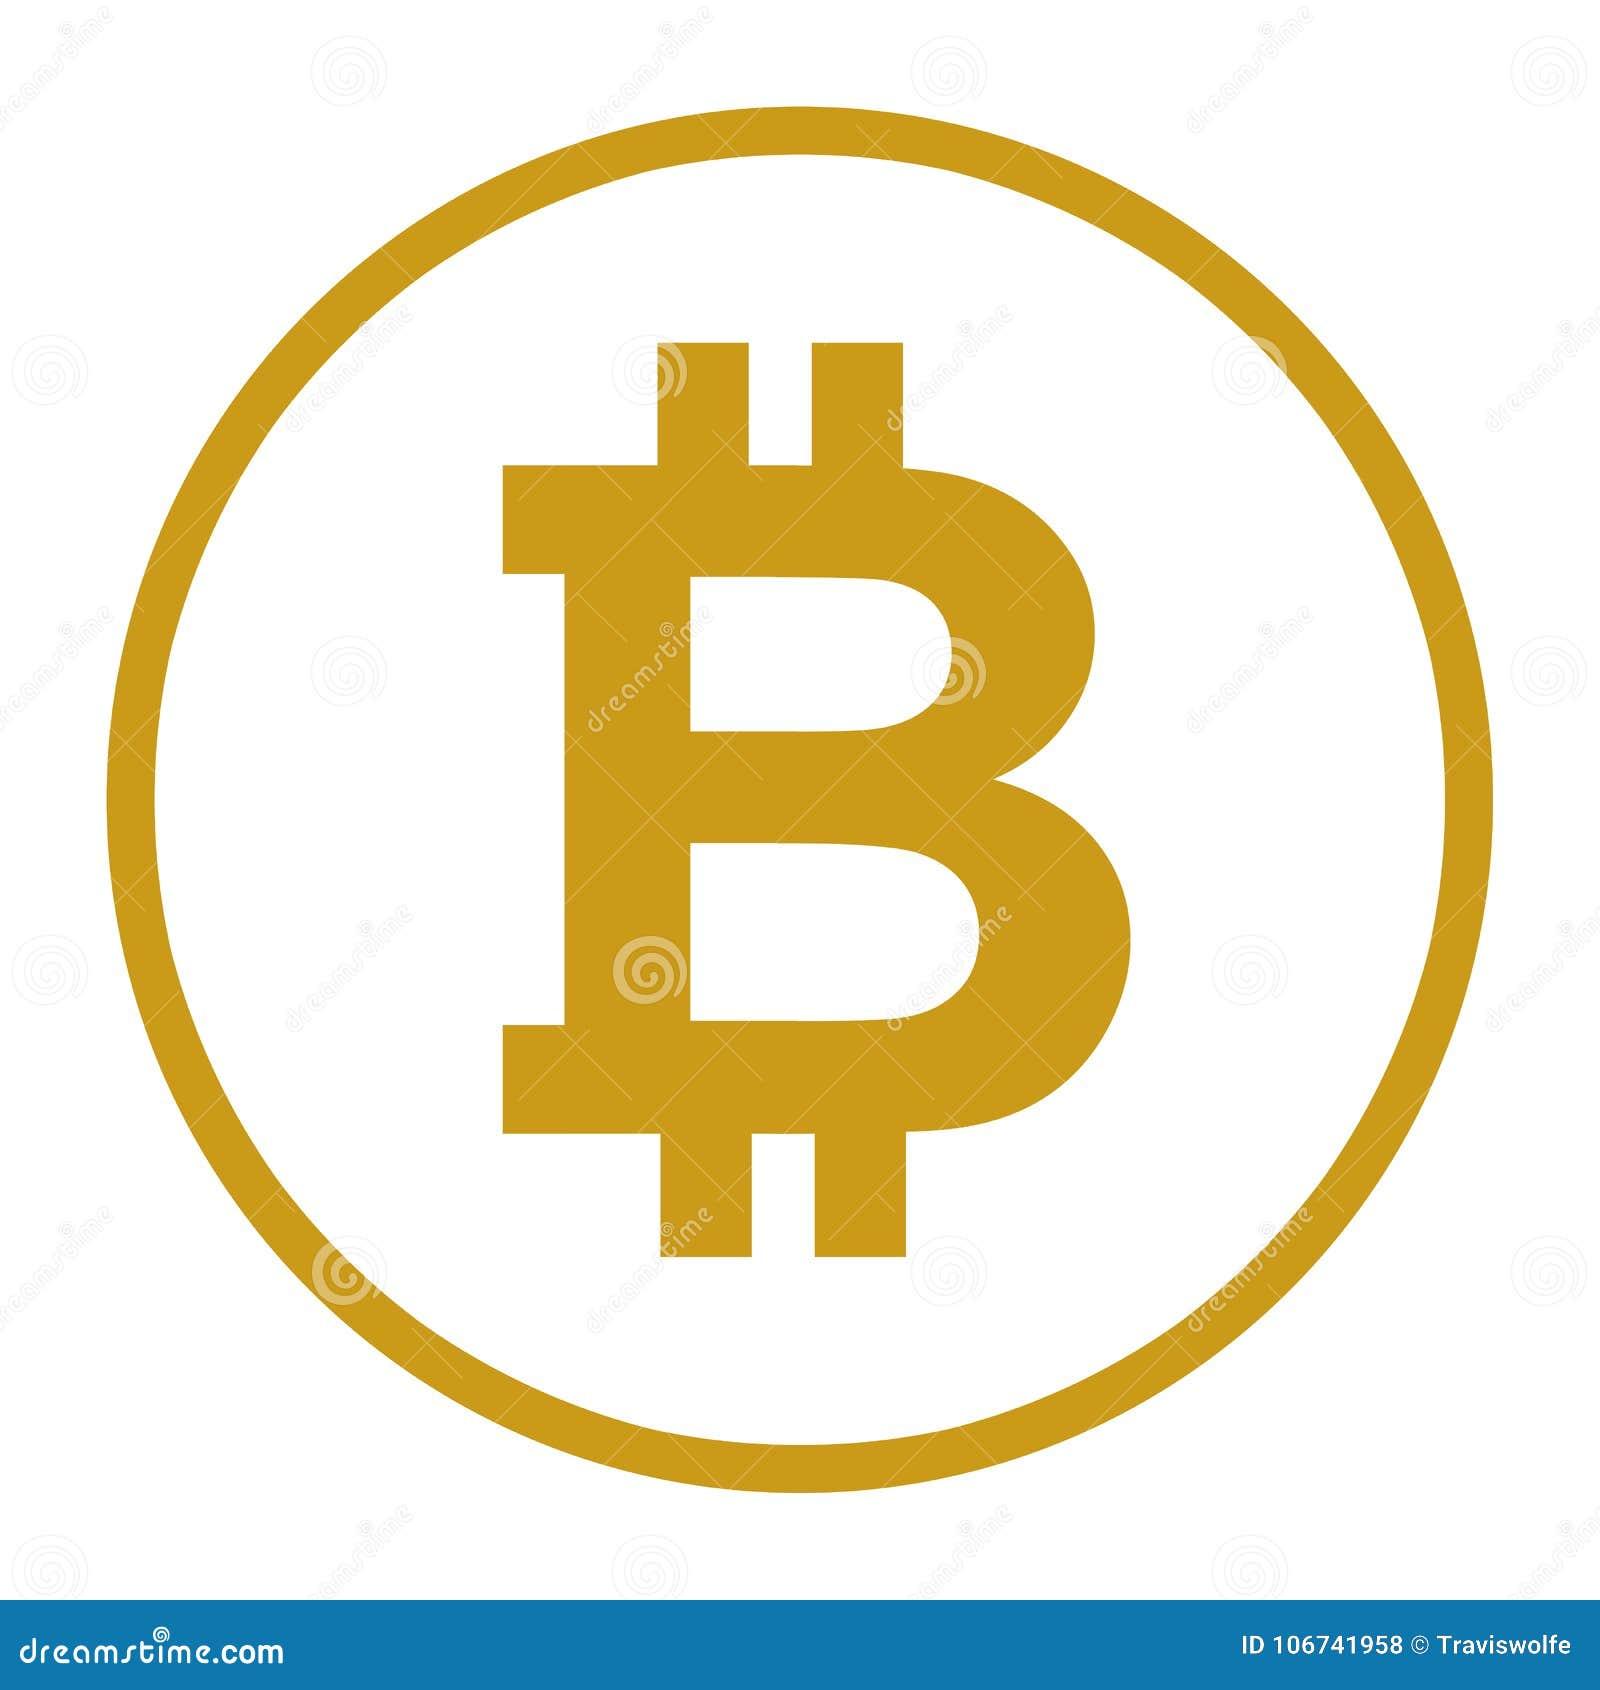 Opbrengst aan de zijlijn crypto currency think ahead group derby party betting